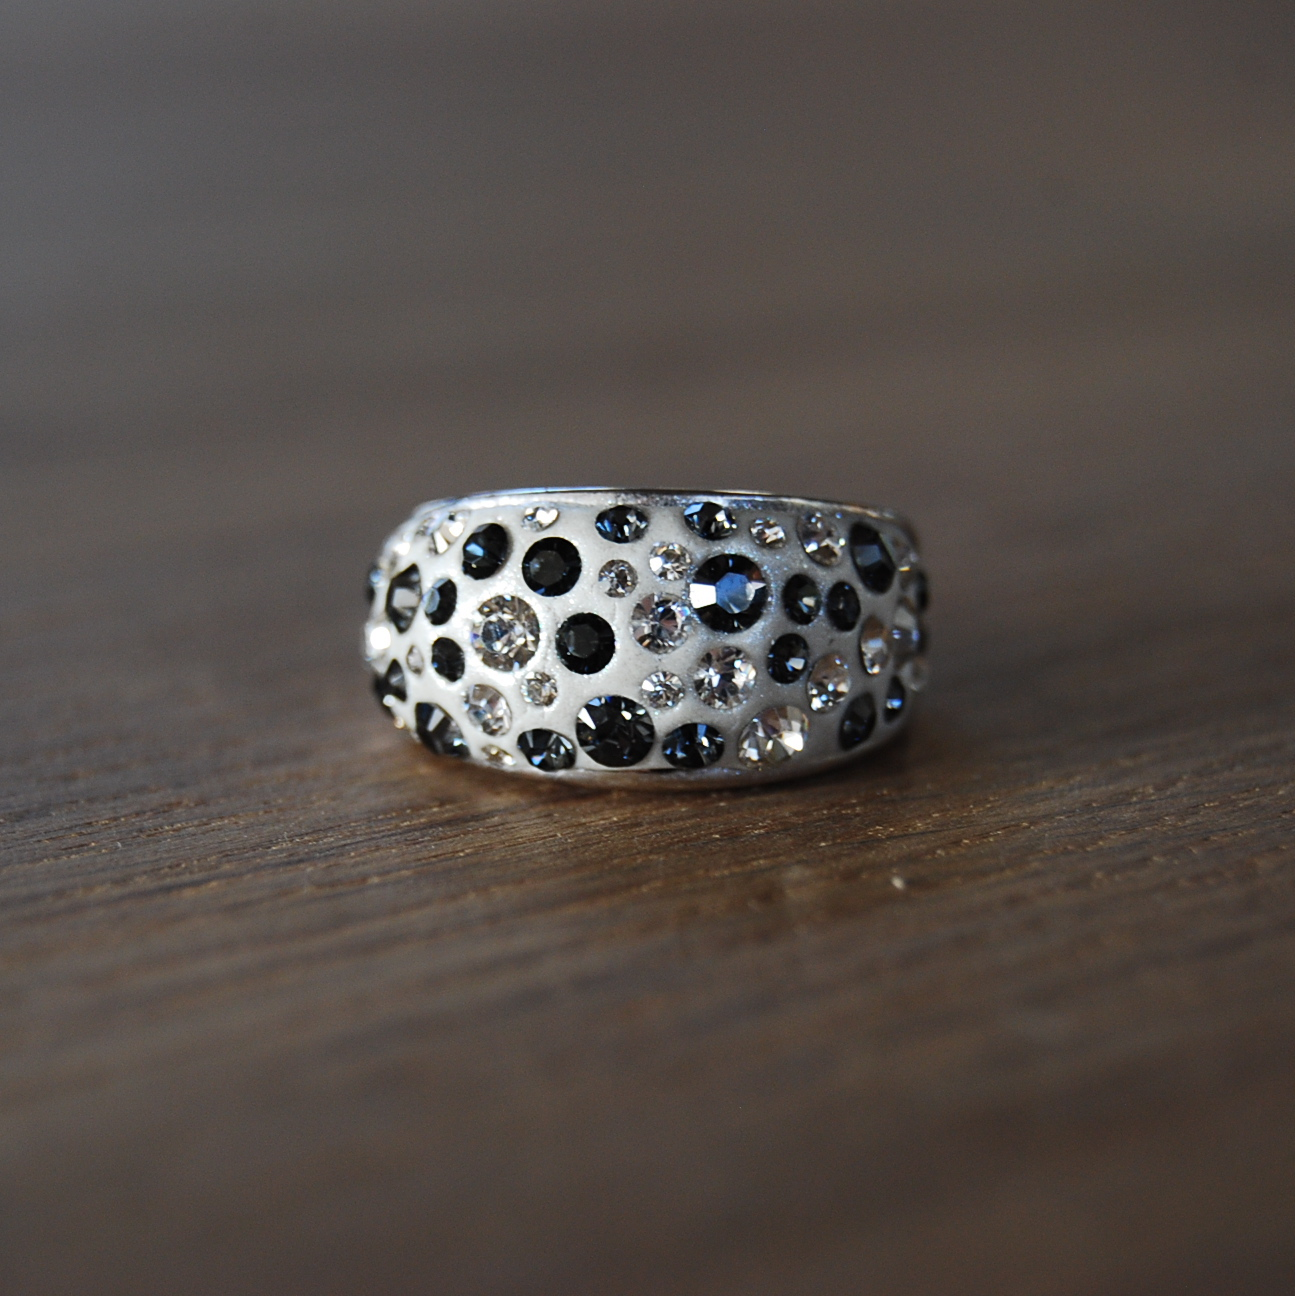 Swarovski Crystal Clay Ring